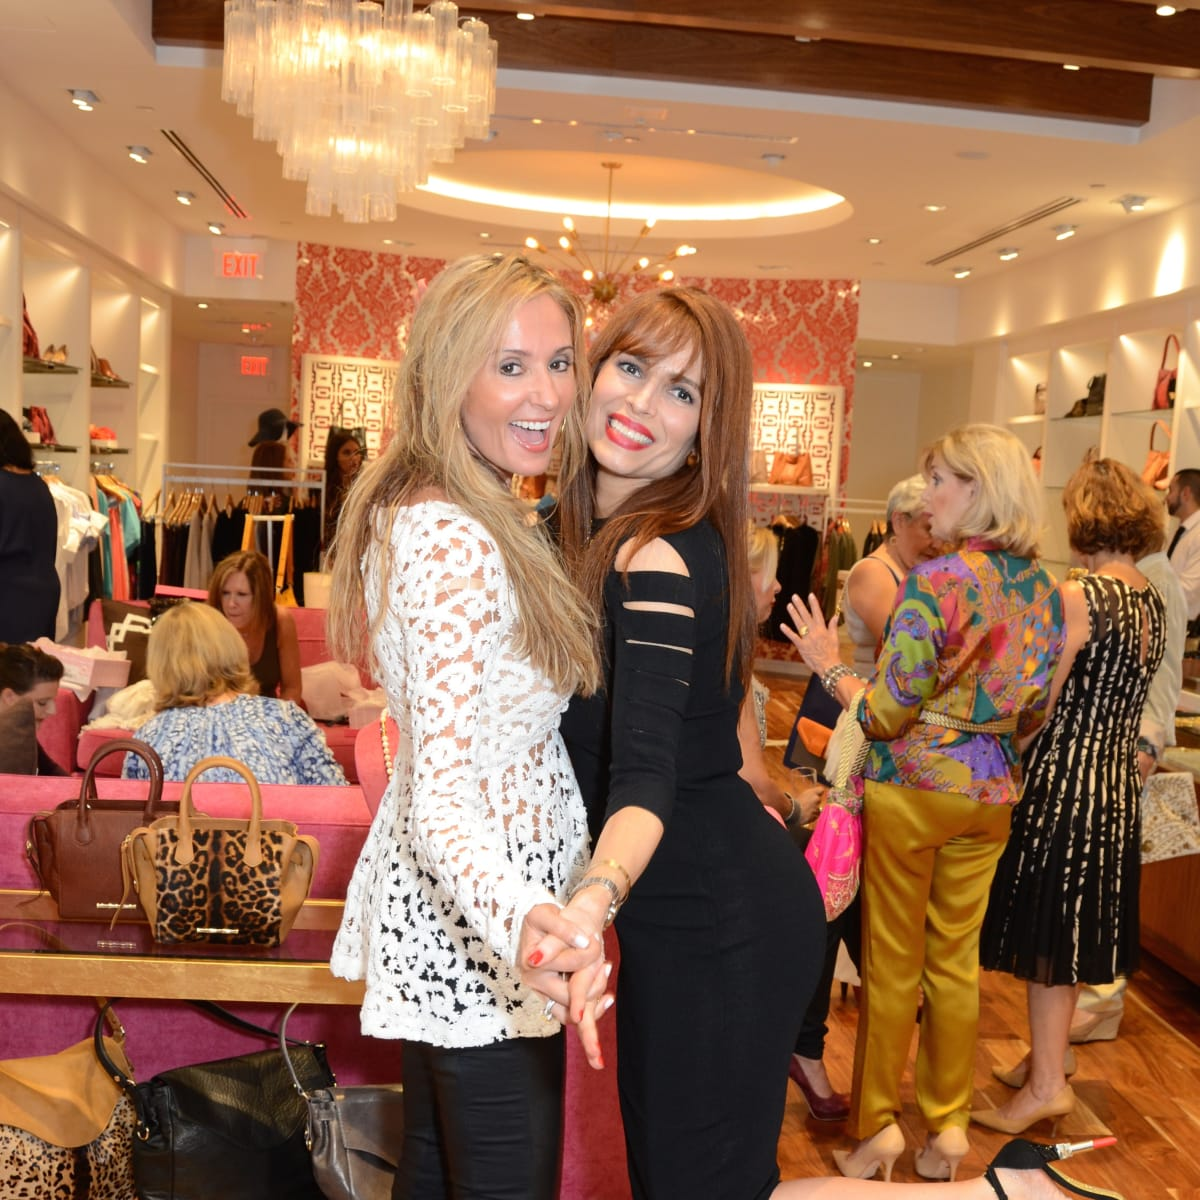 News, Shelby, Latin Women's Initiative party, Sept. 2015, Cindy Garza Farmer, Karina Barbieri